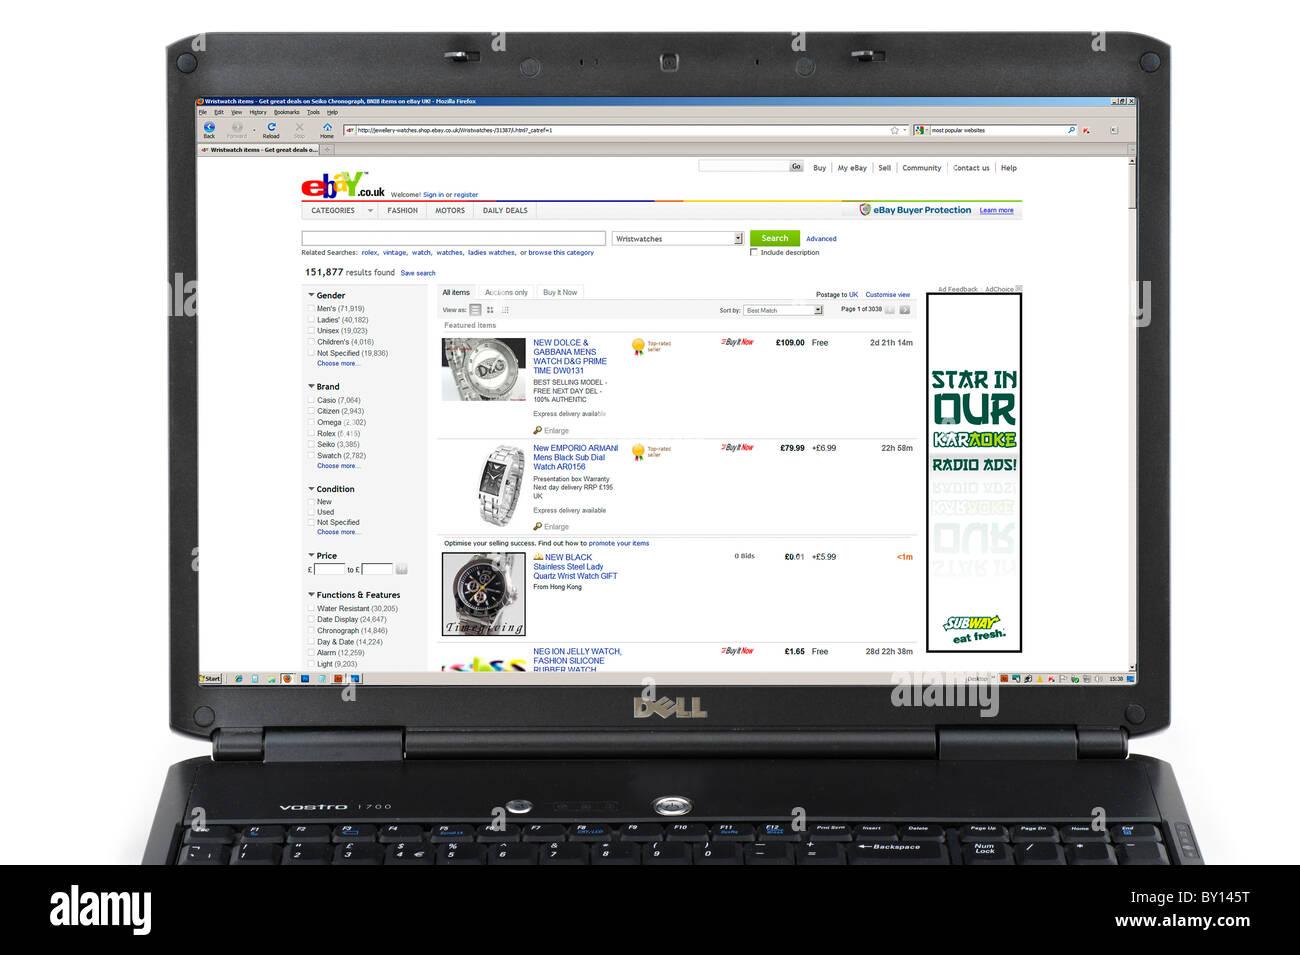 Browsing Ebay Co Uk On A Laptop Computer Uk Stock Photo Alamy